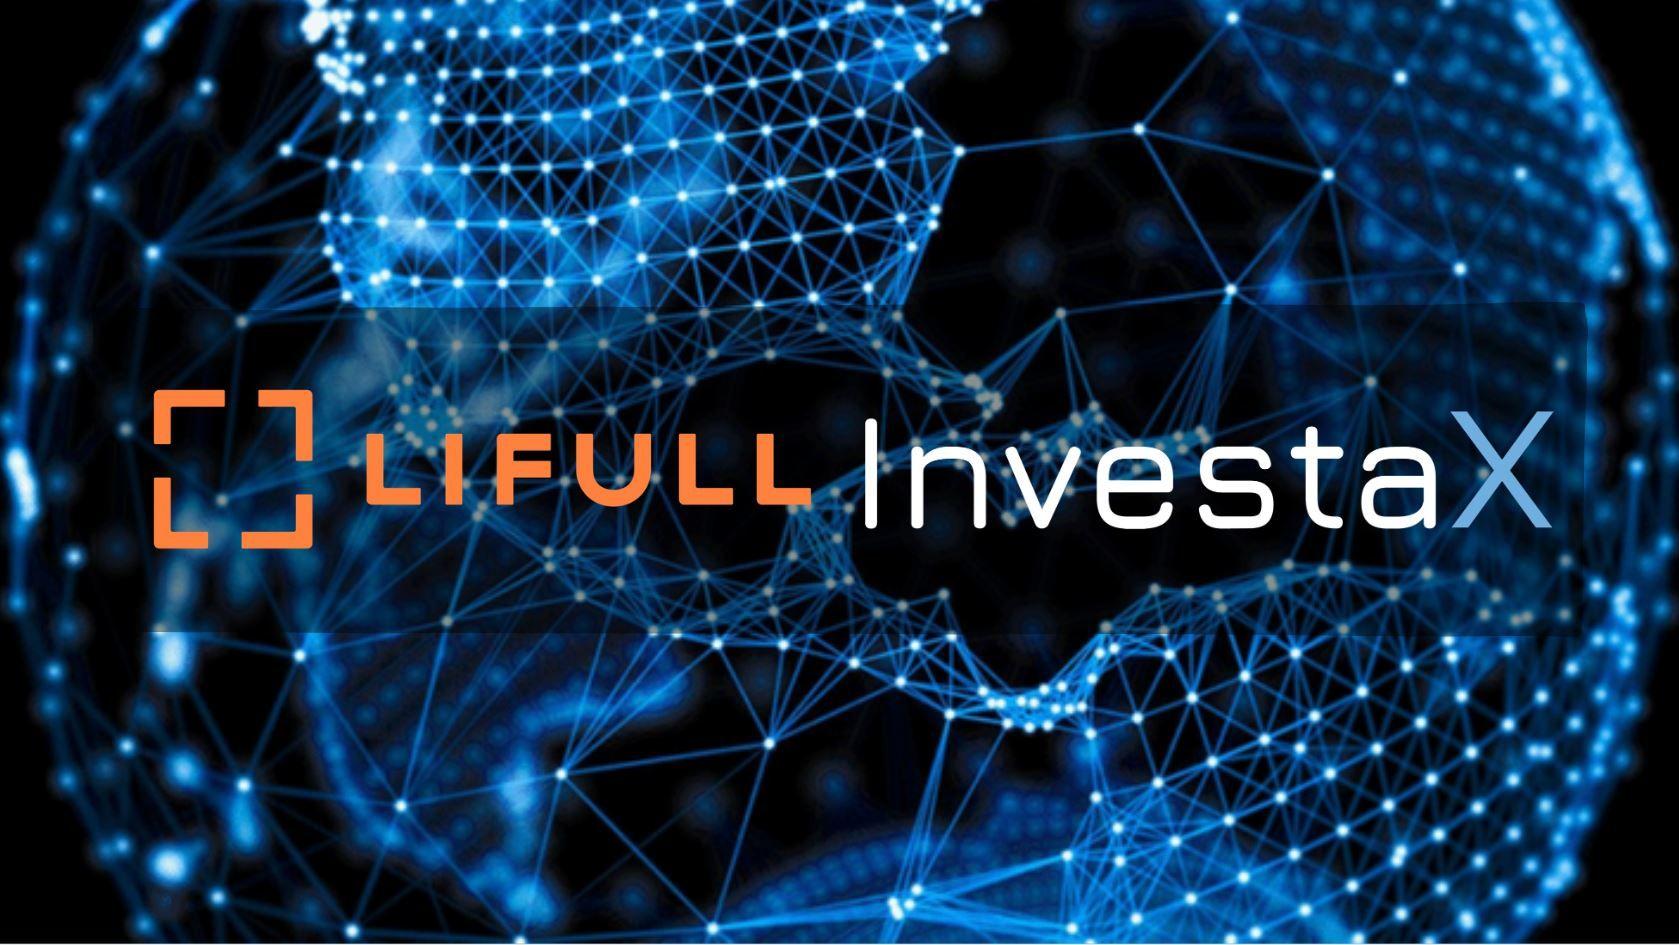 Press Release: Digital Securities - Singapore & Japan Partnership